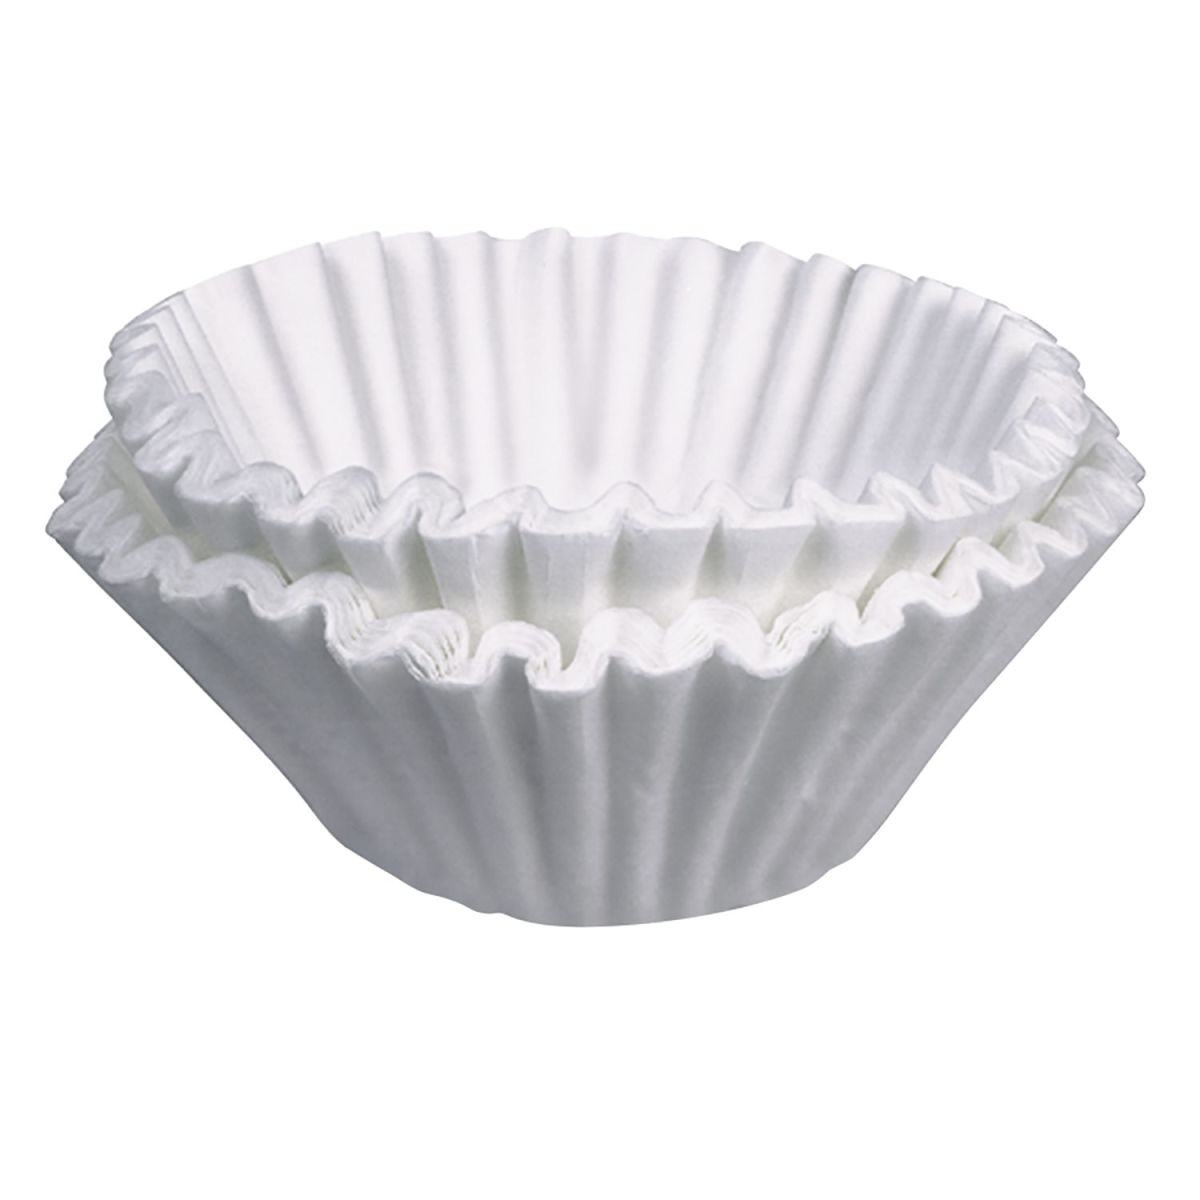 Urn - 6Gal (22.7L) Paper Filters 252/cs